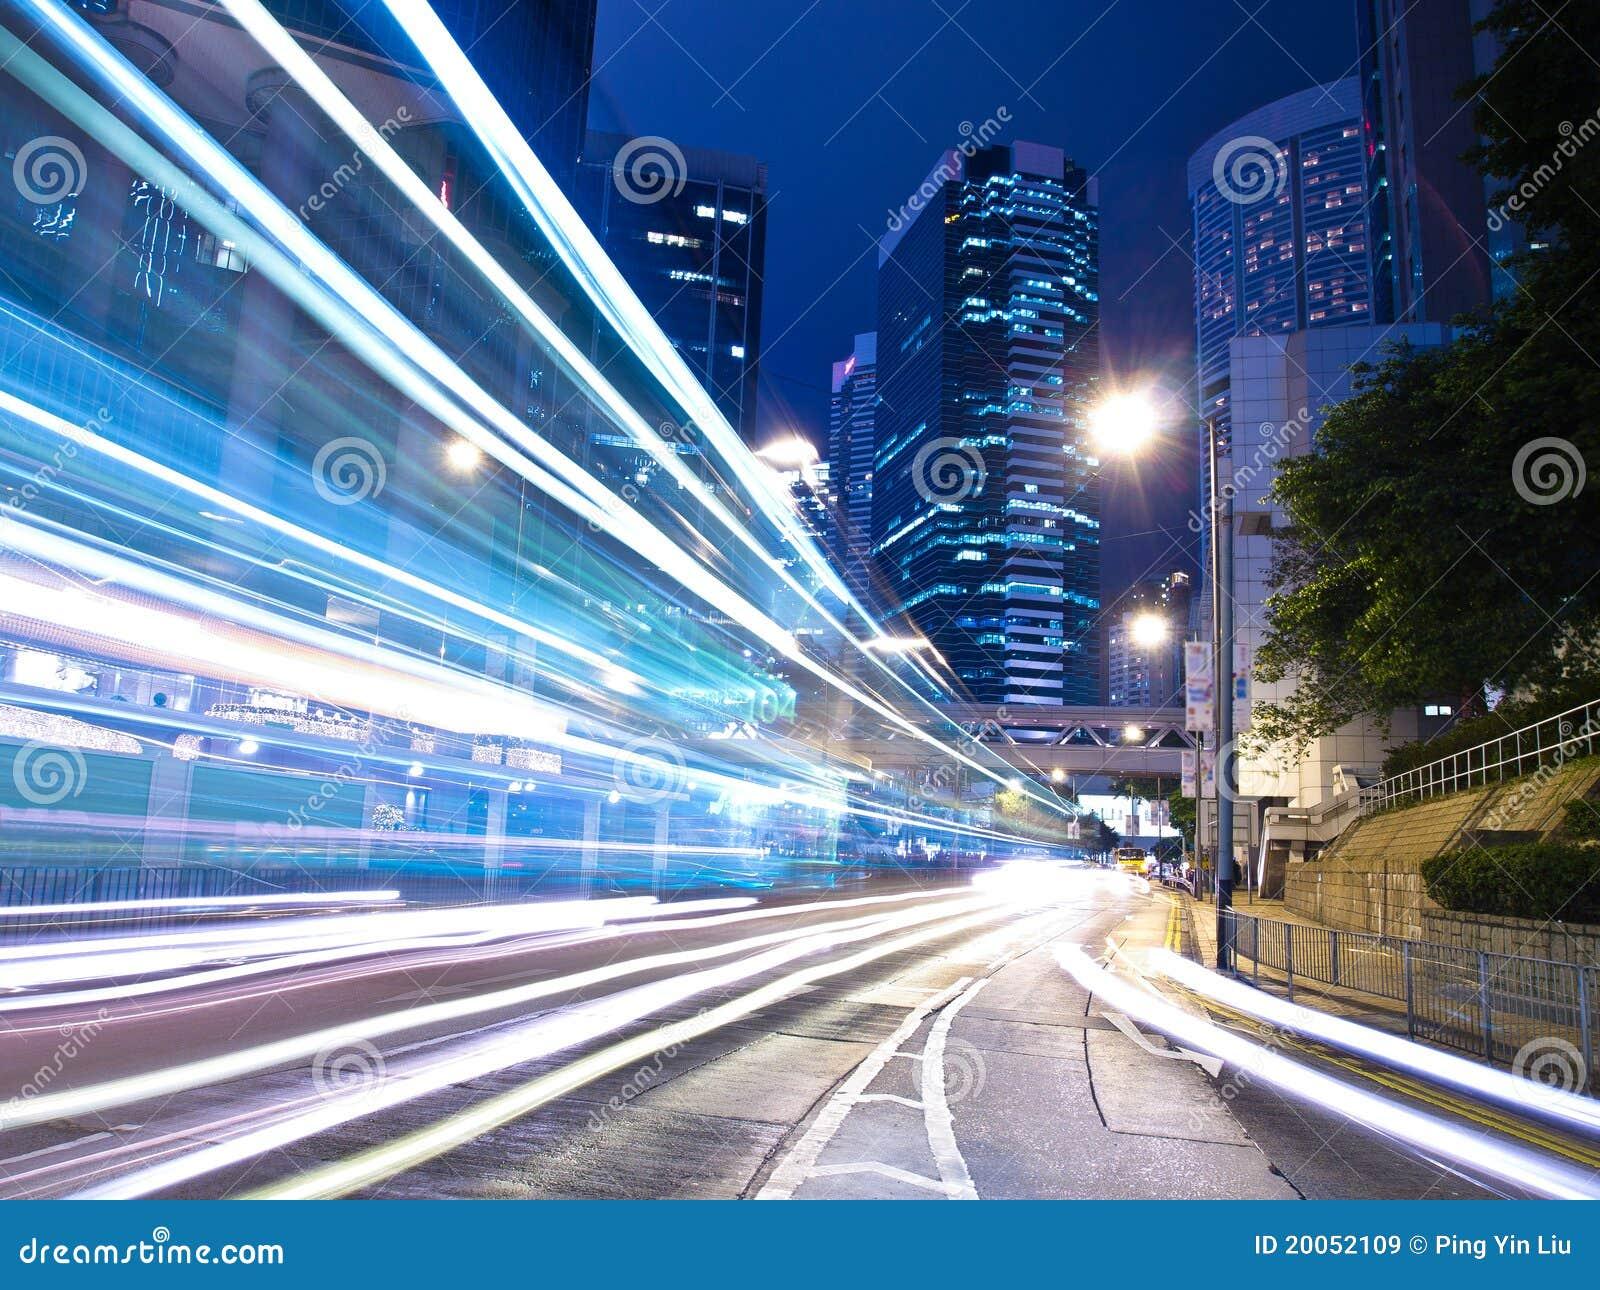 Urban City Traffic at Night